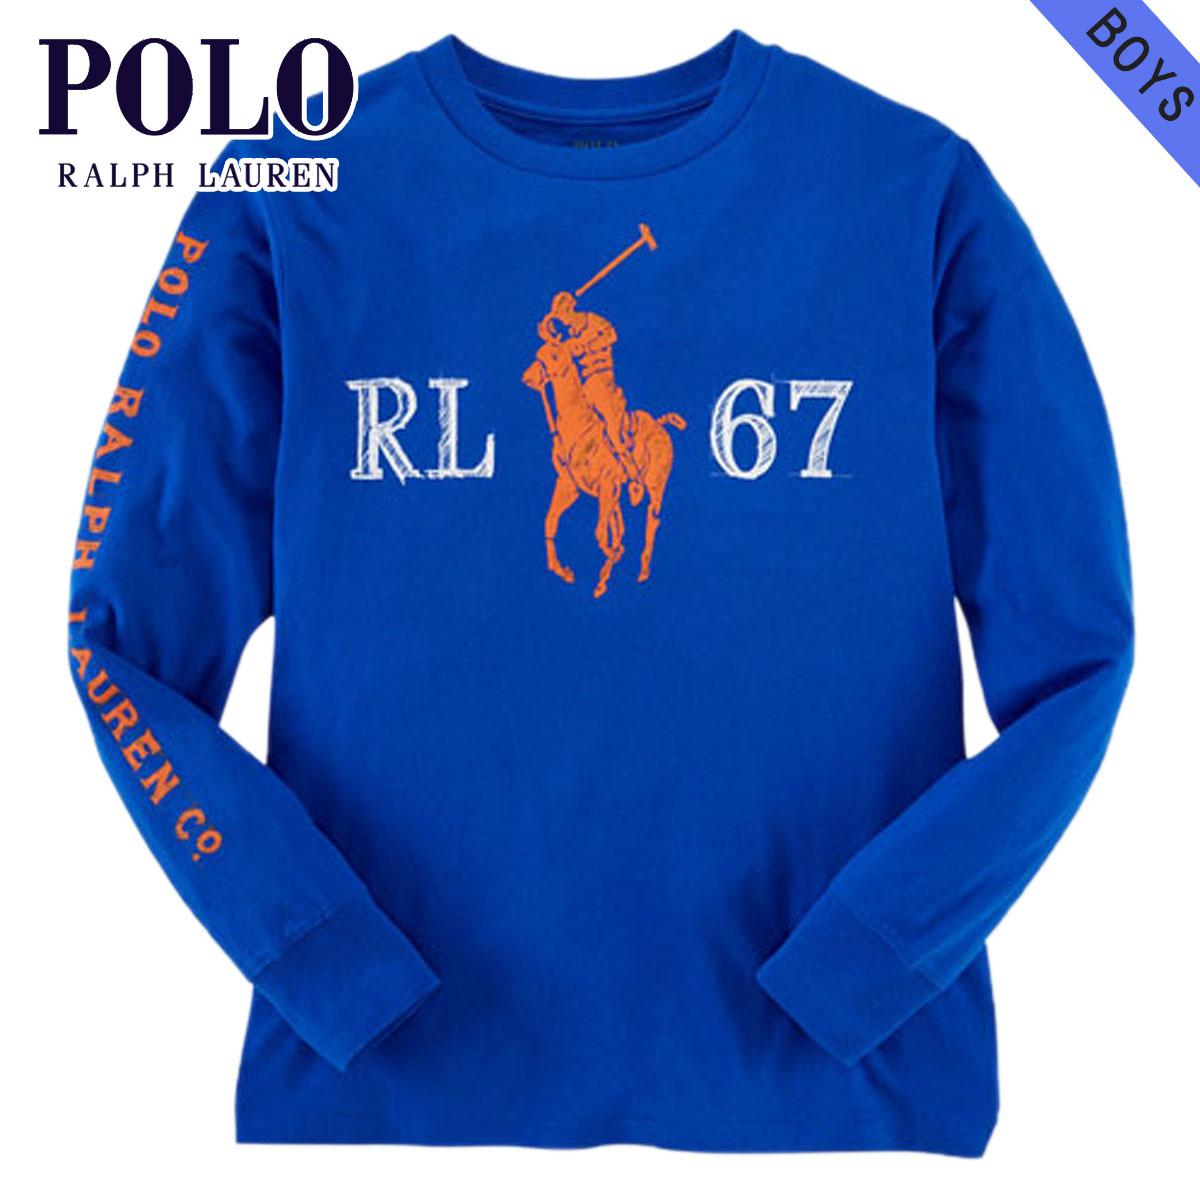 Poloralflorenkids POLO RALPH LAUREN CHILDREN genuine kids clothes boys long sleeve T shirt COTTON GRAPHIC TEE 48766436